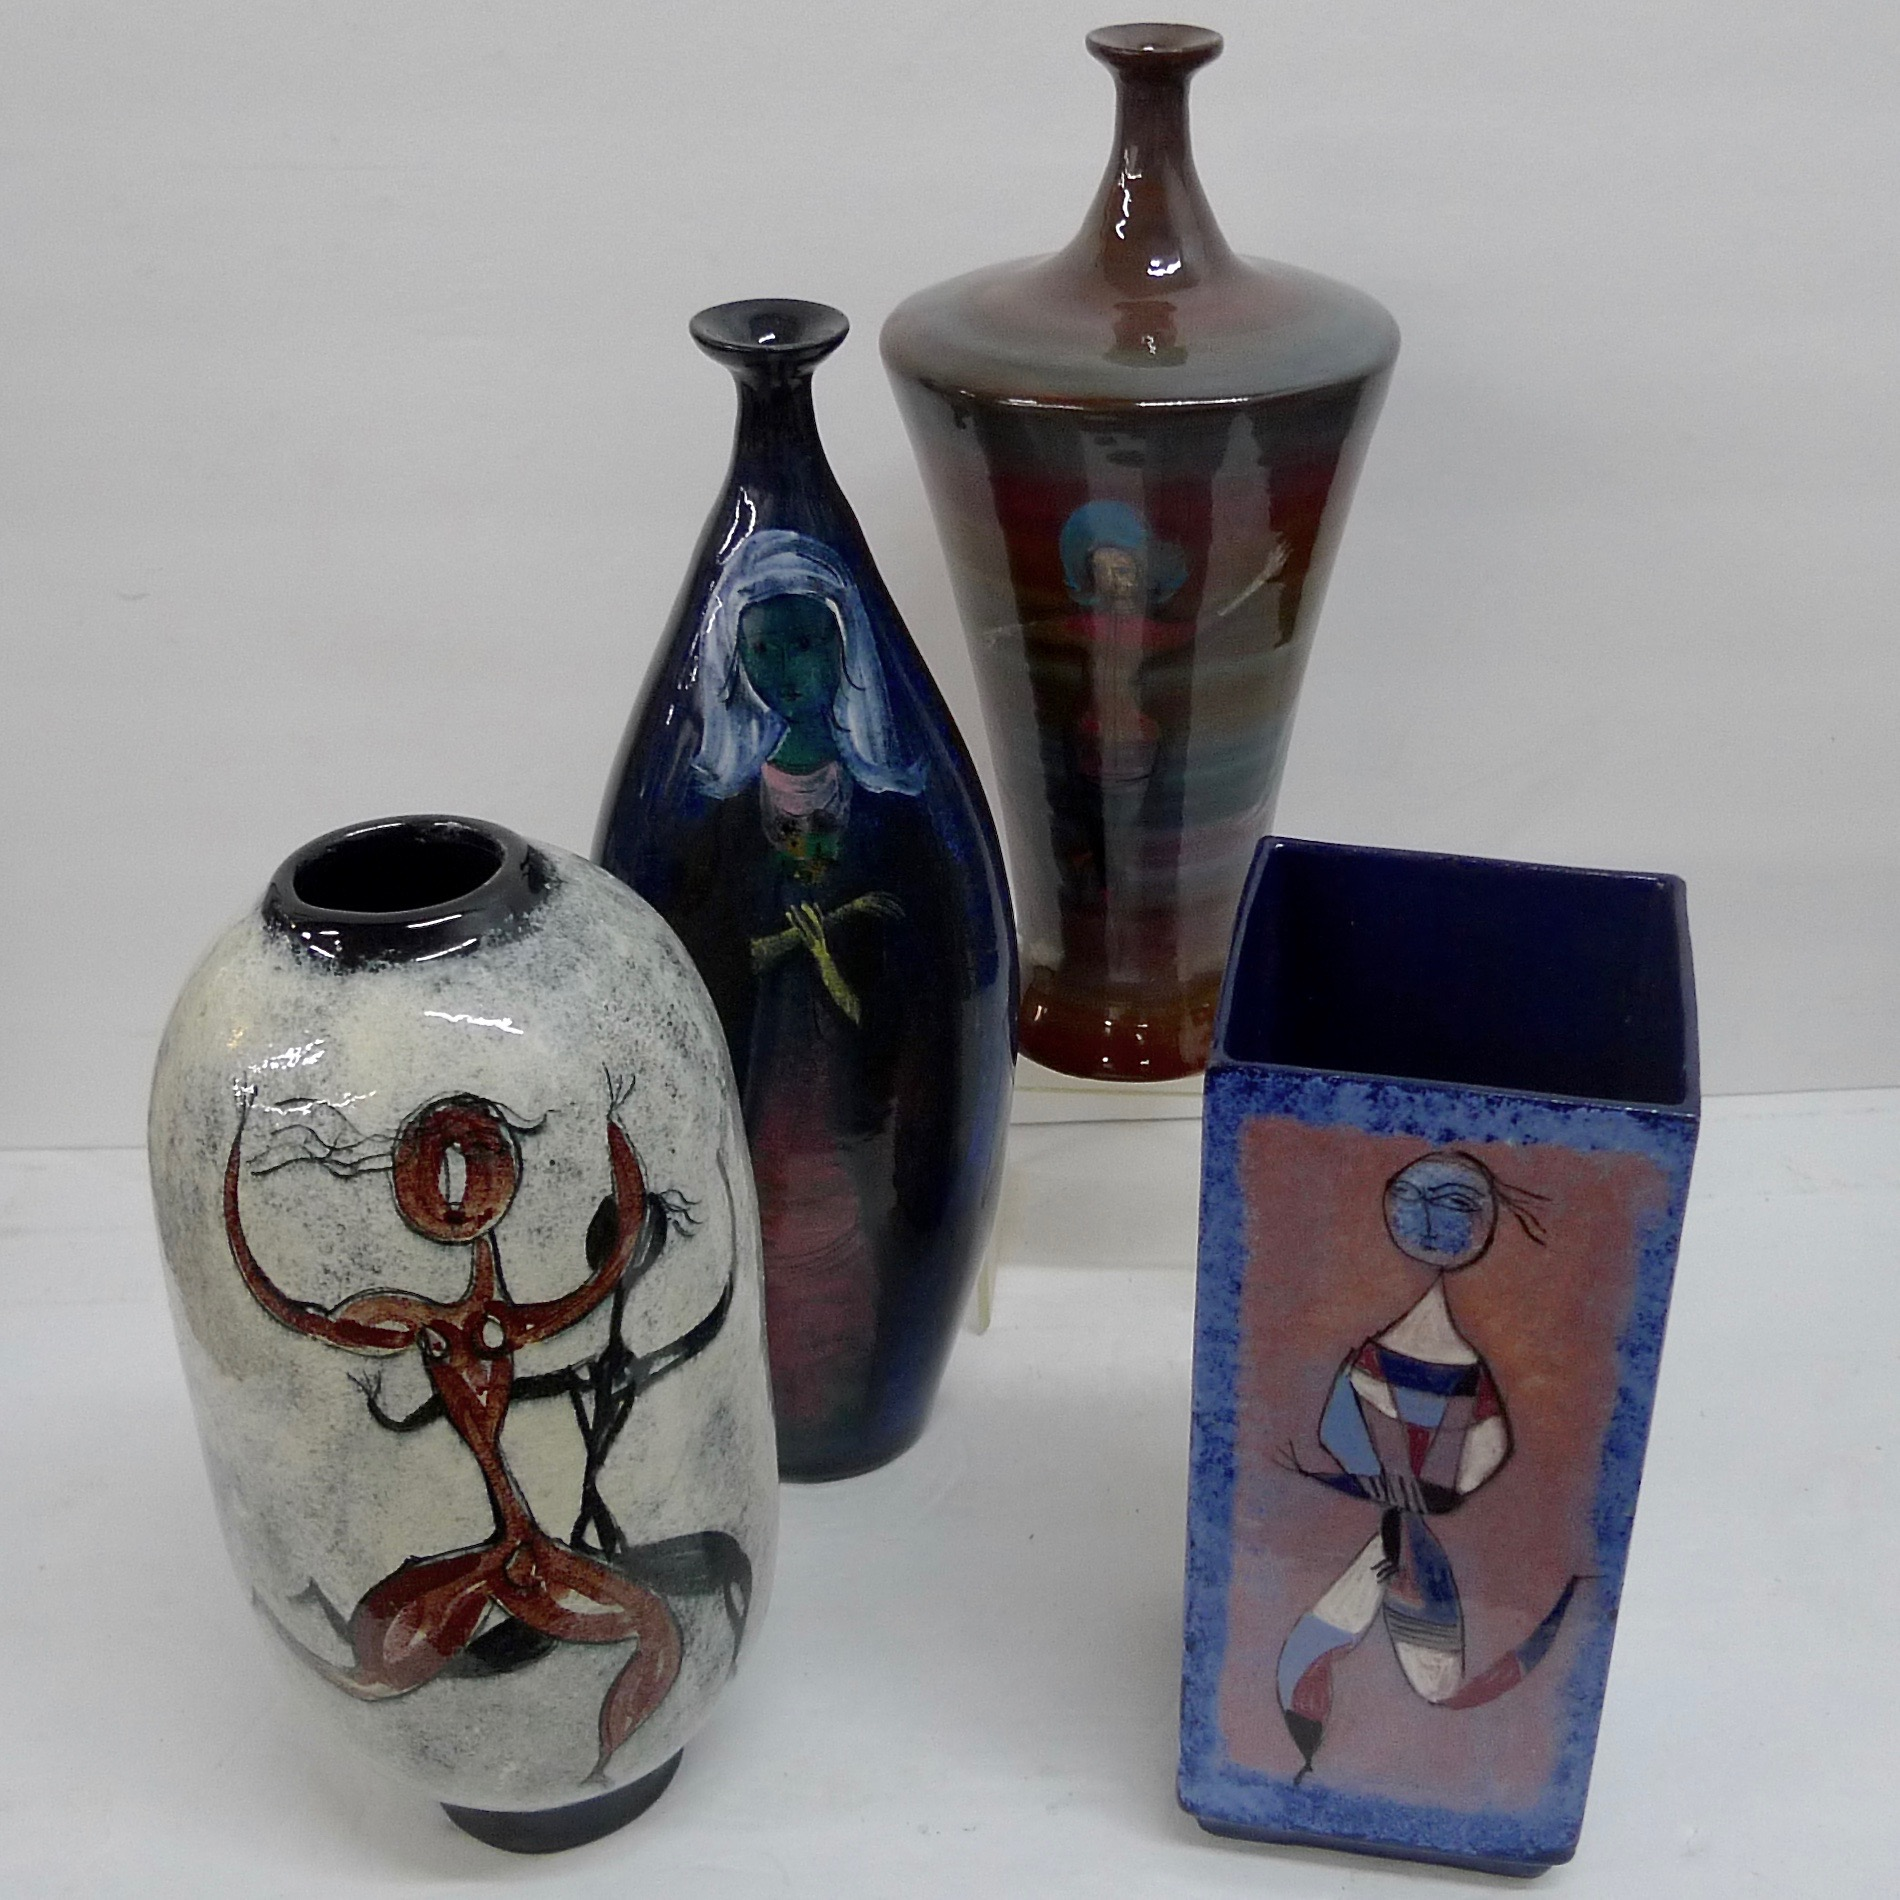 Tall Polia Pillin Vases - Wells Tile & Antiques   On-line